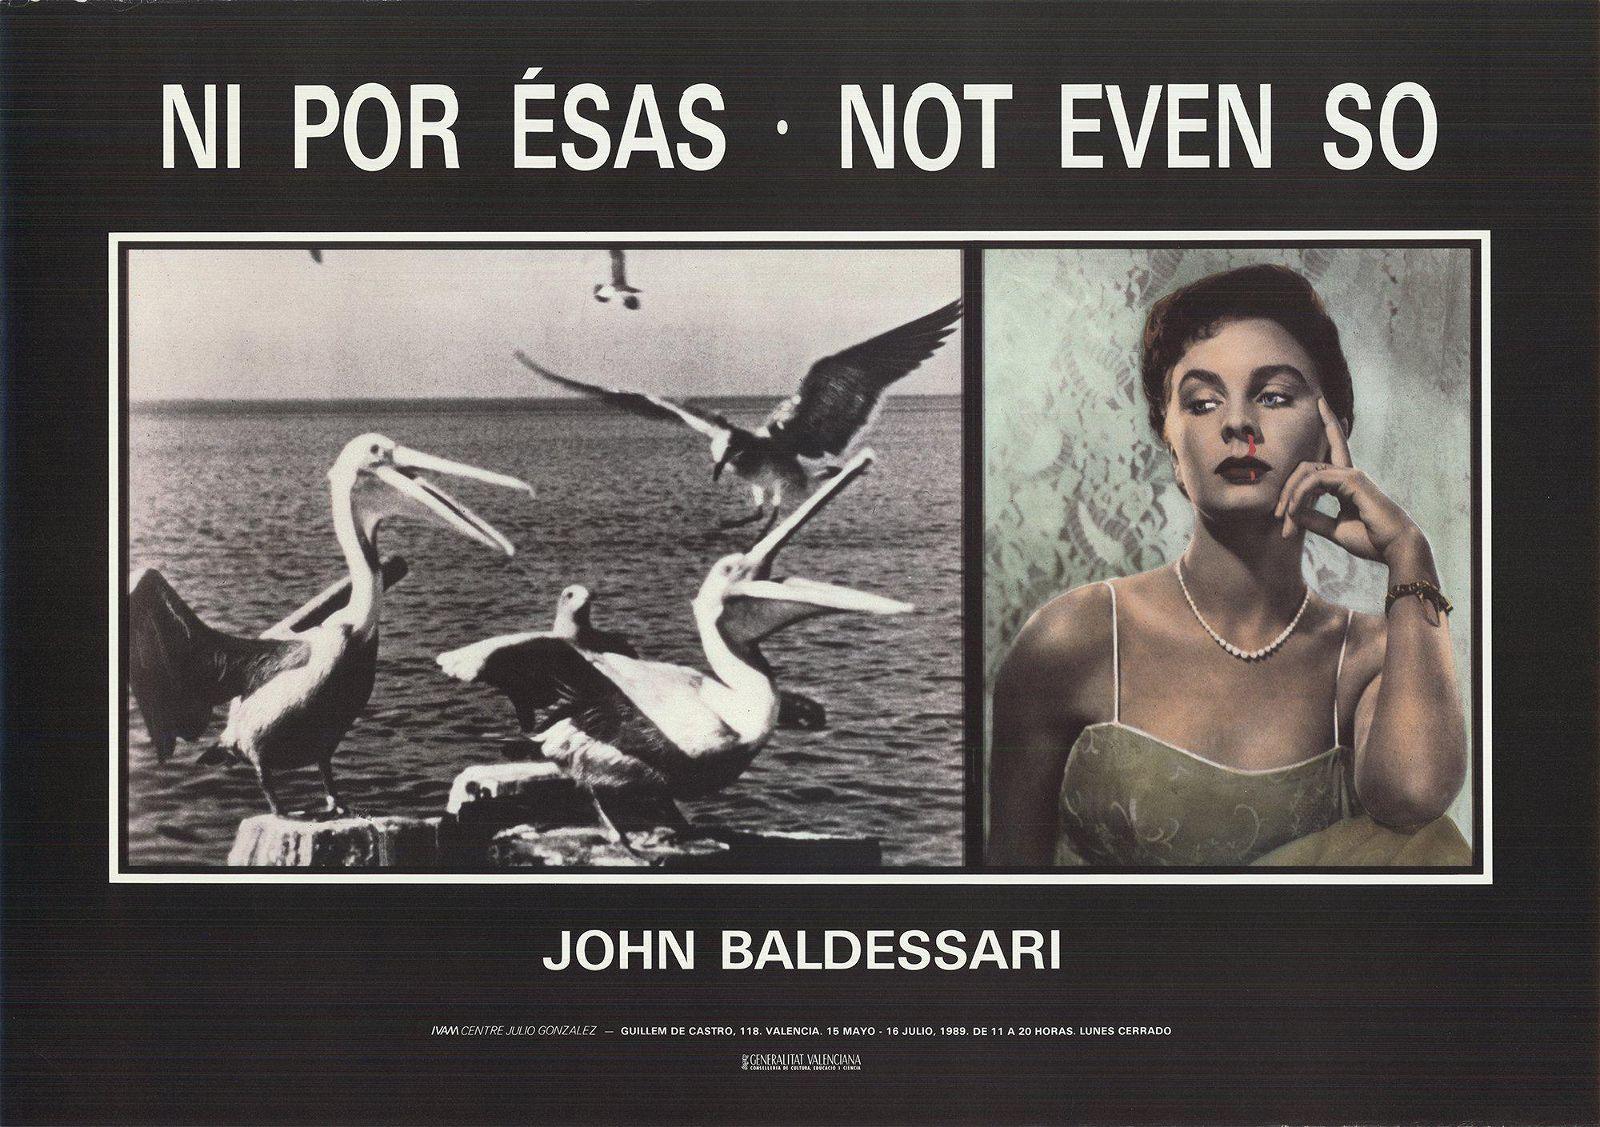 John Baldessari: Not Even So